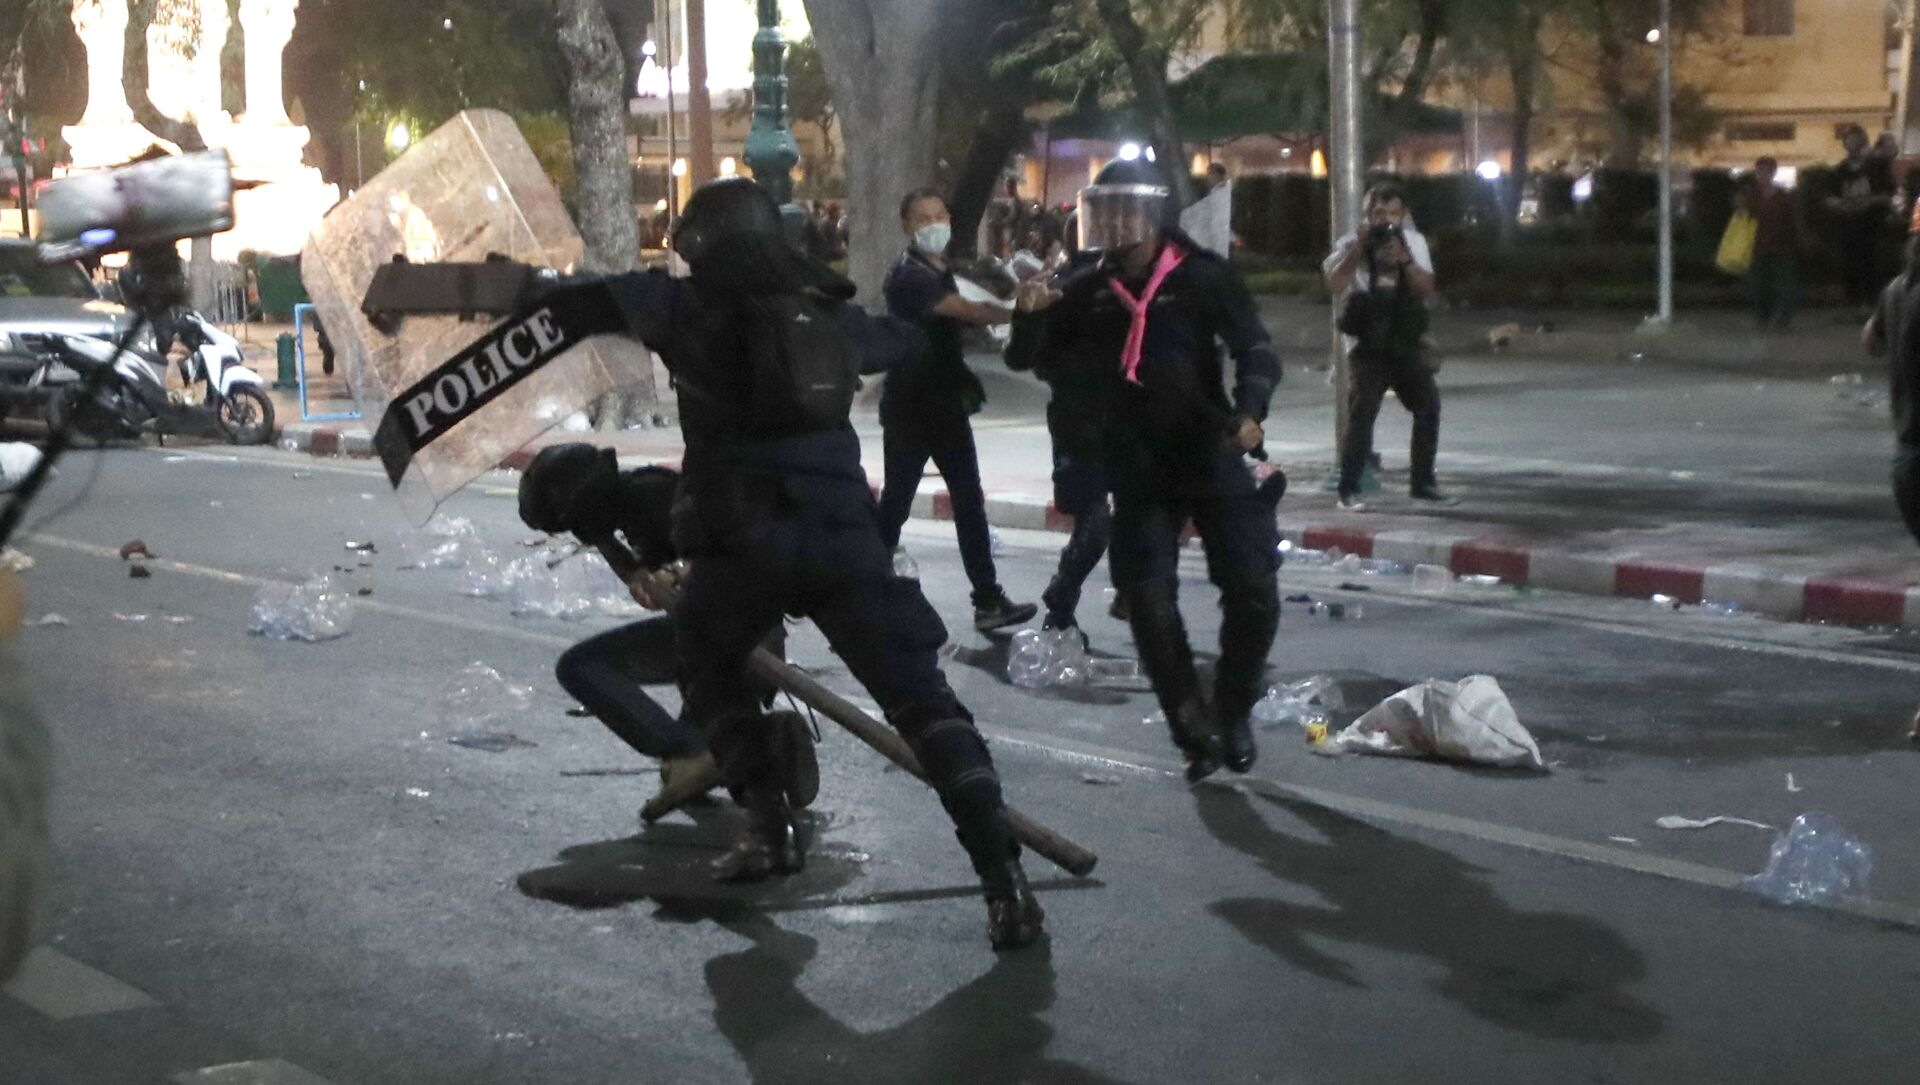 Policja rozpędza demonstrację, Bangkok - Sputnik Polska, 1920, 20.03.2021